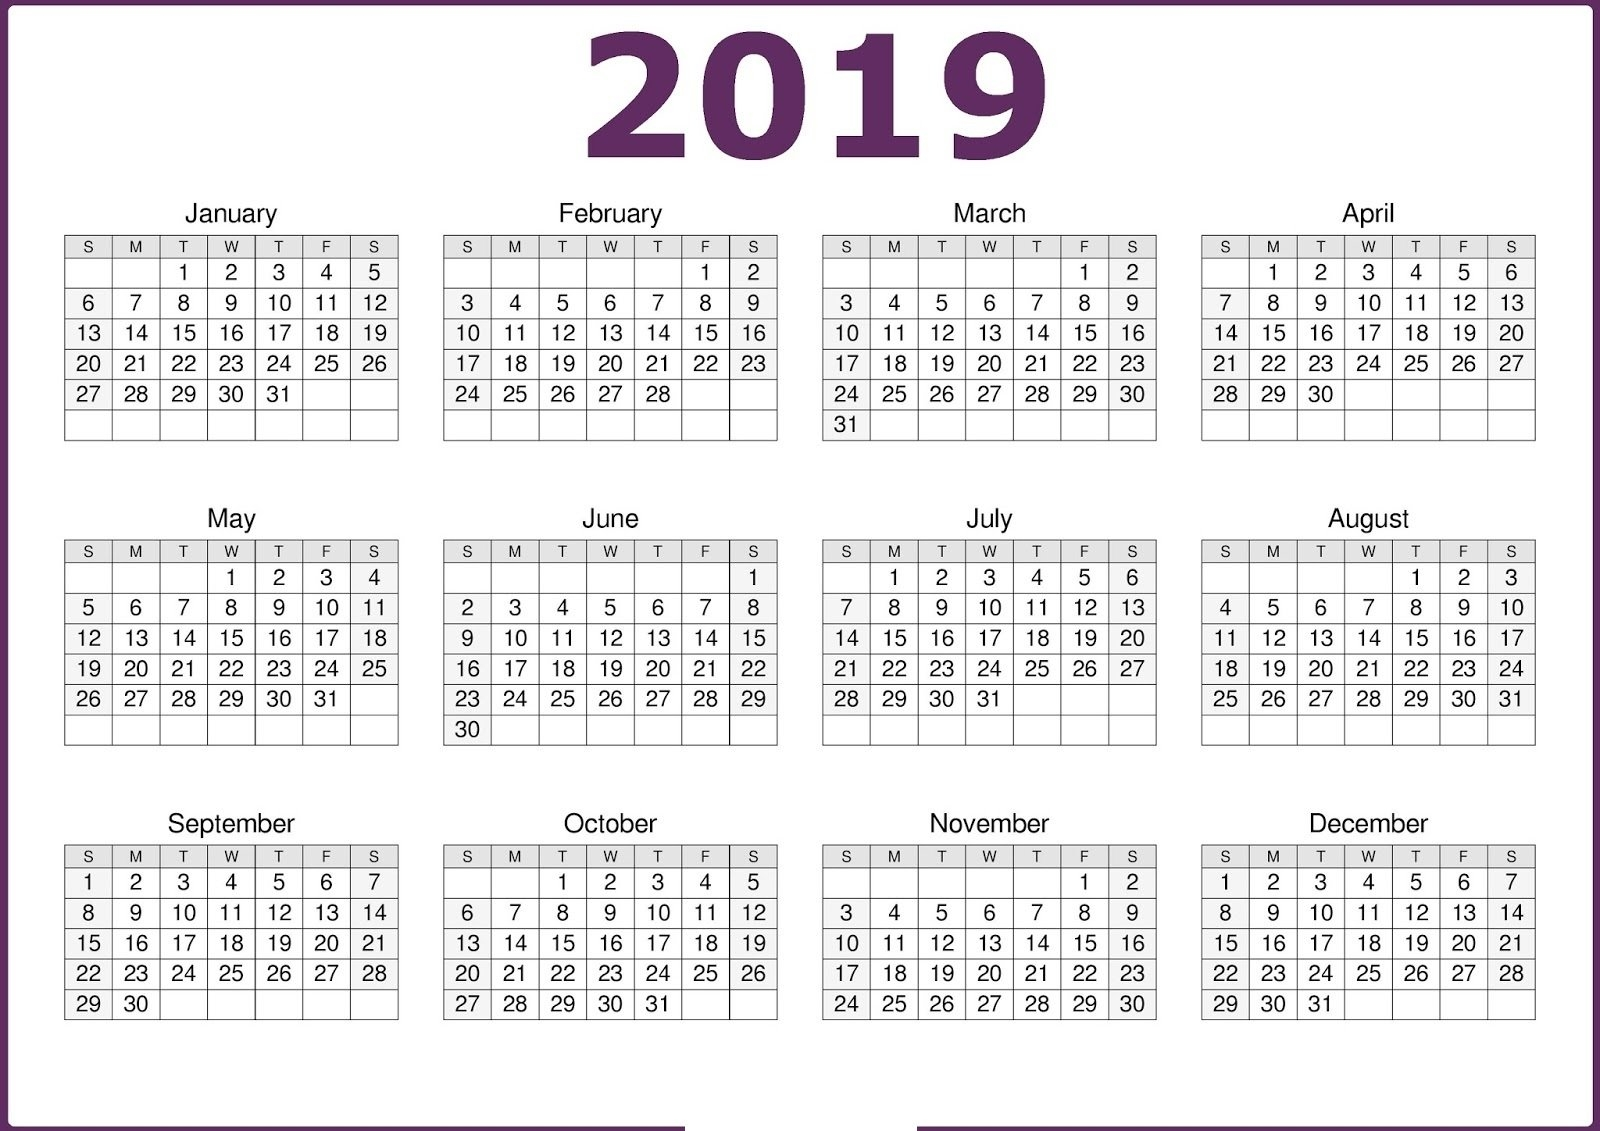 Get Free Blank Calendar Pages 2019 Templates   August 2018 Calendar 2019 Calendar Queensland Printable